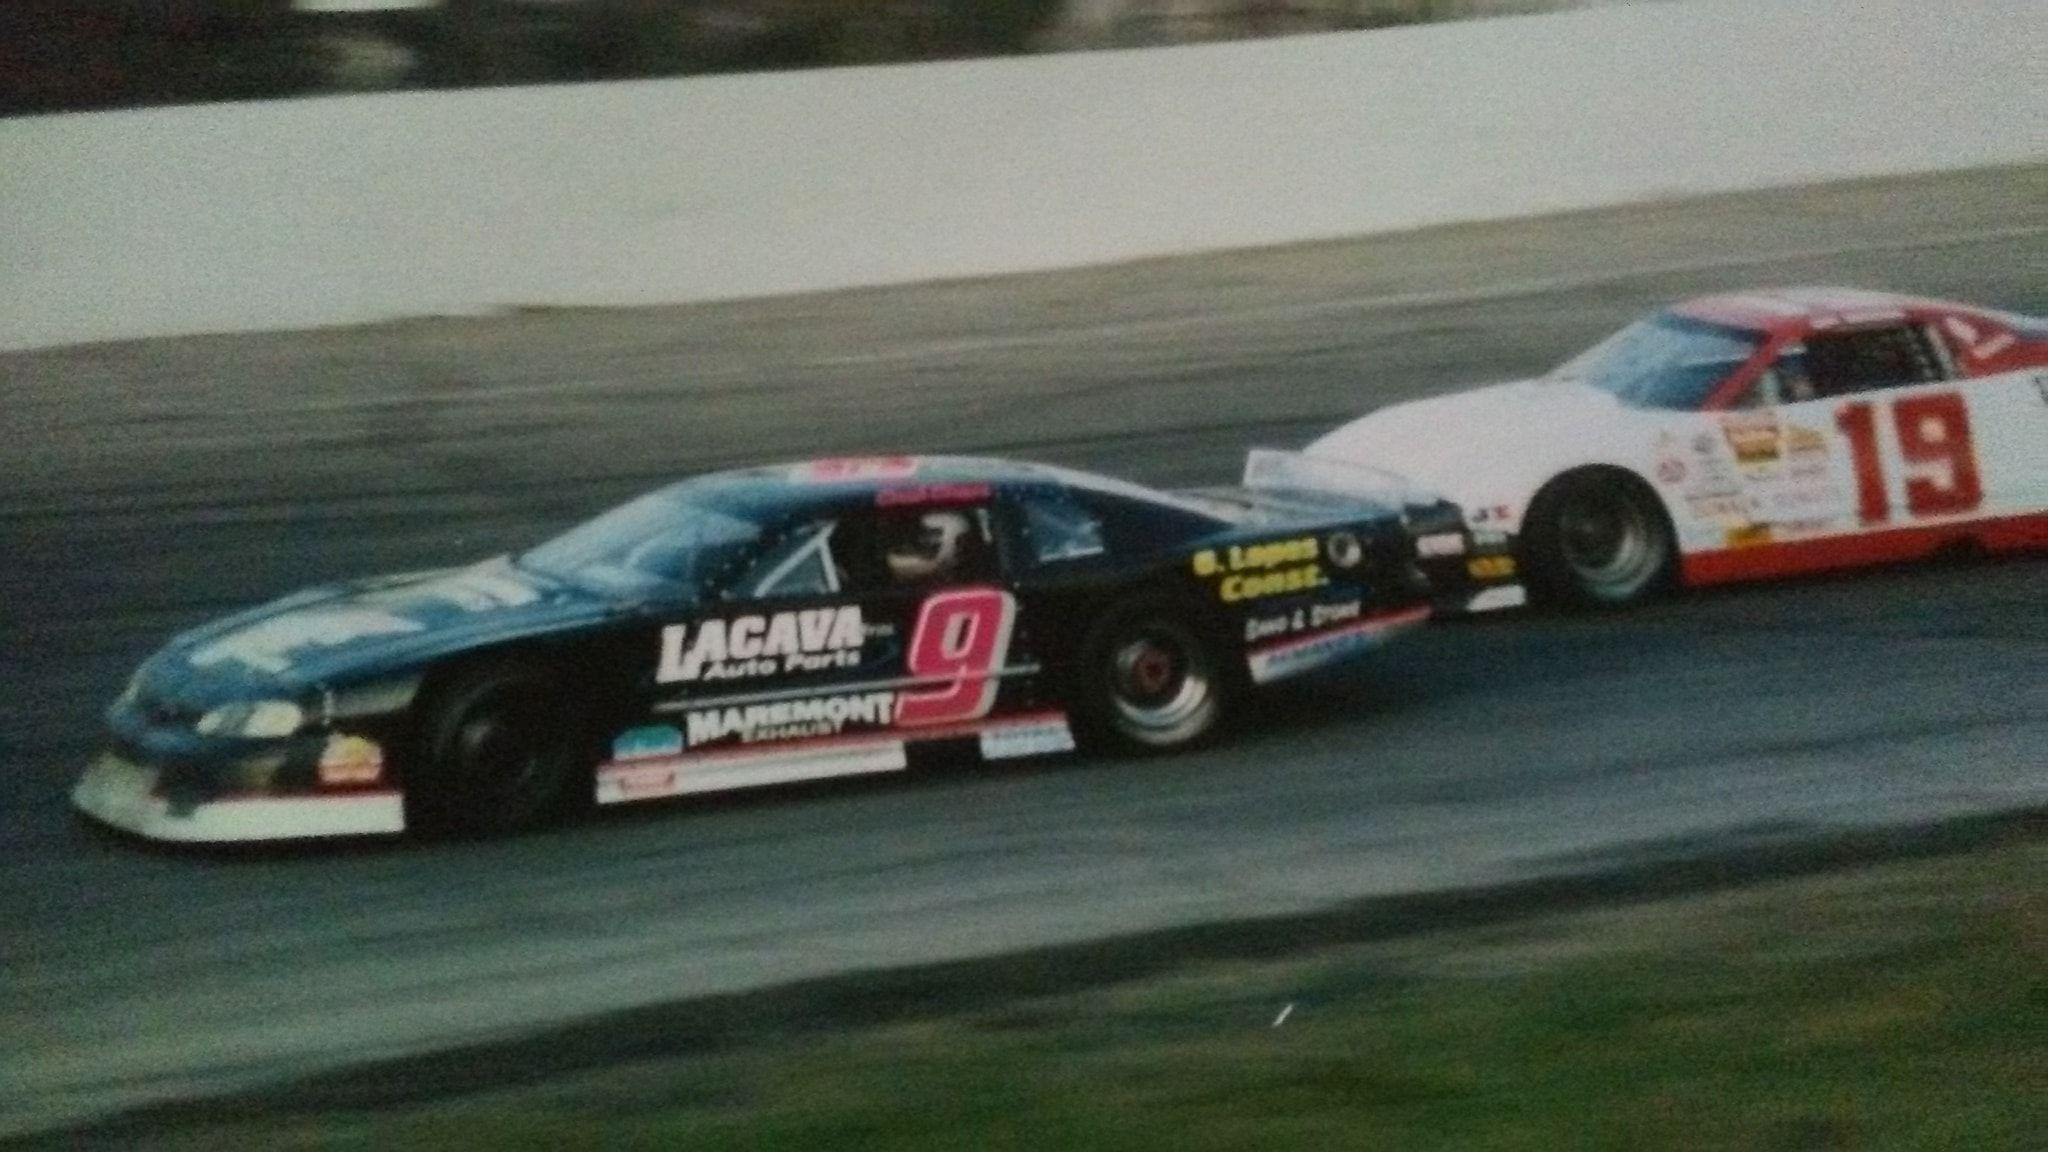 Chad Chace Jeff Zuidema   Midget Race Cars and old stockcars ...